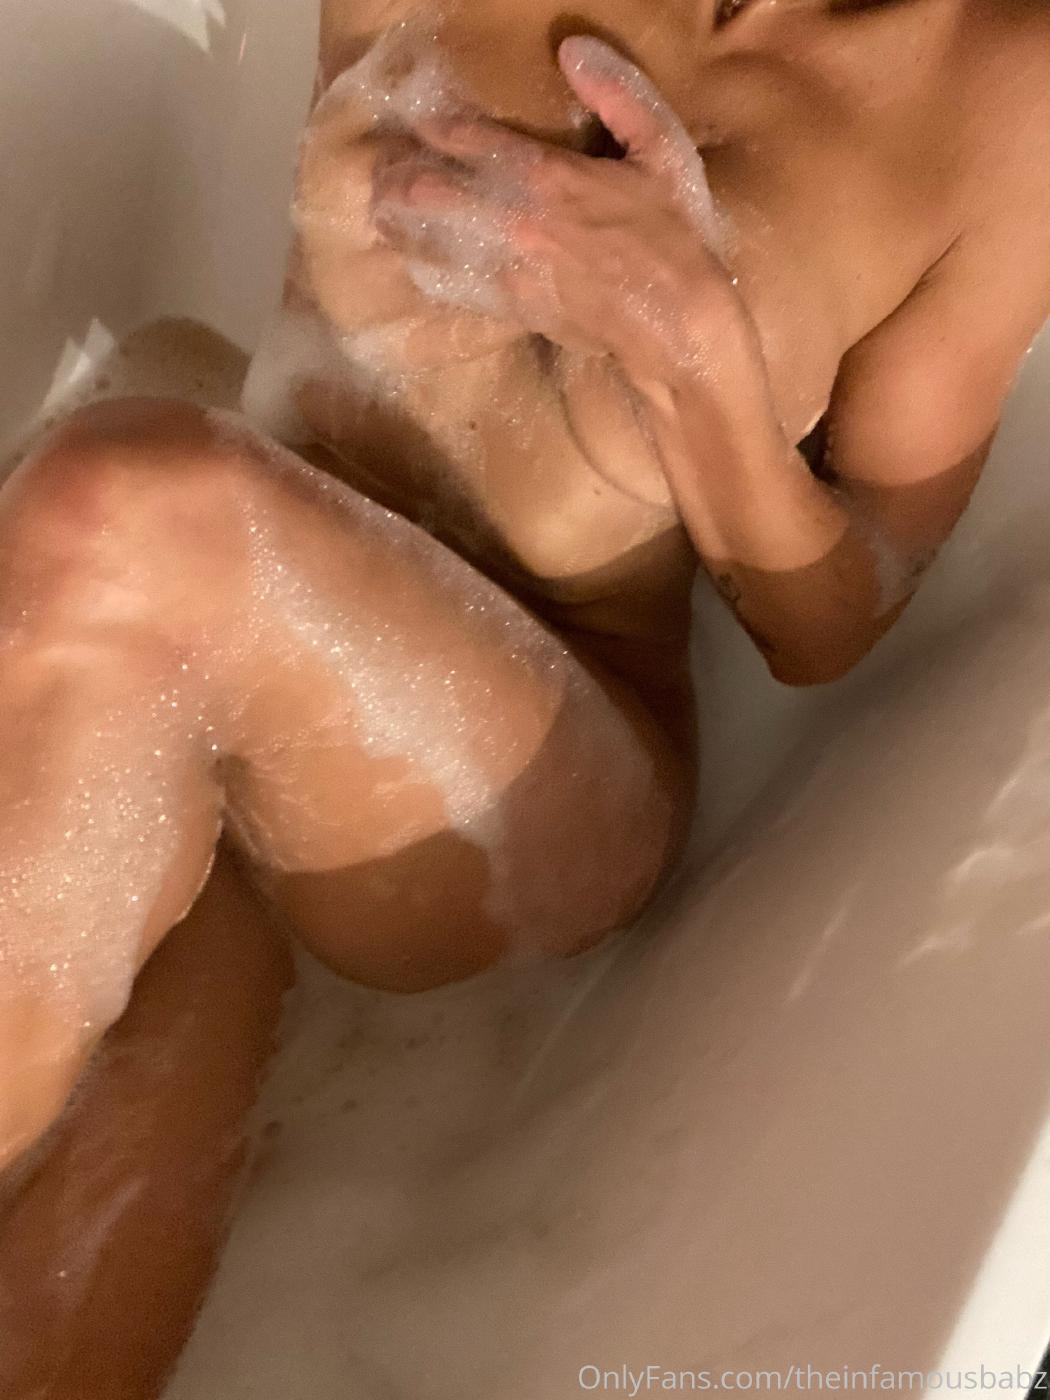 Gabbie Hanna Nude Bath Onlyfans Set Leaked Gluhfc